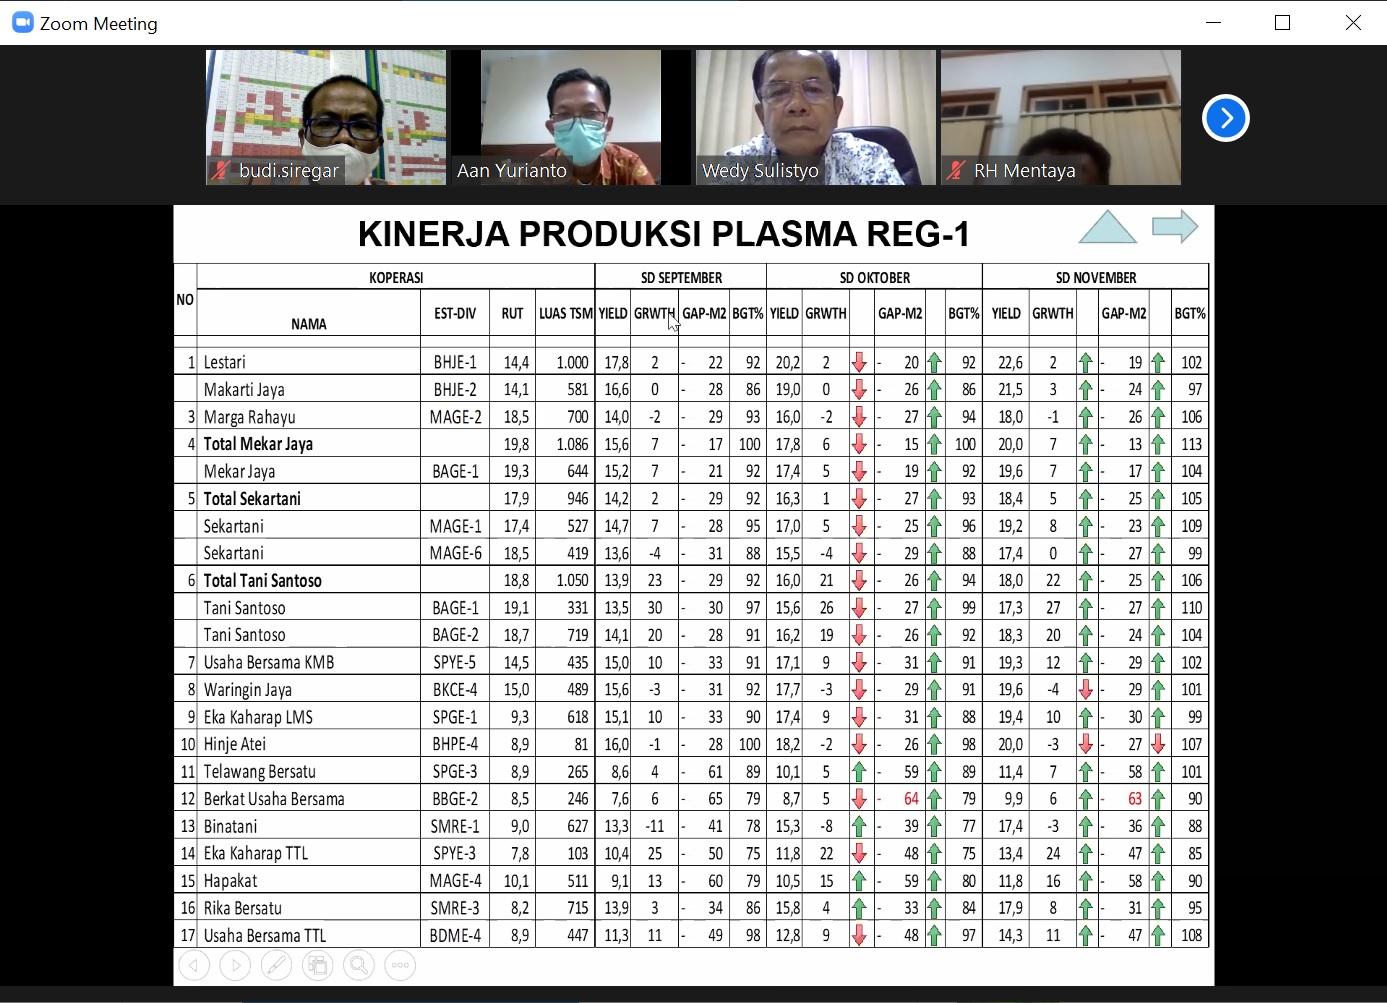 Kinerja Produksi Plasma Regional Mentaya, sd Nopember 2020